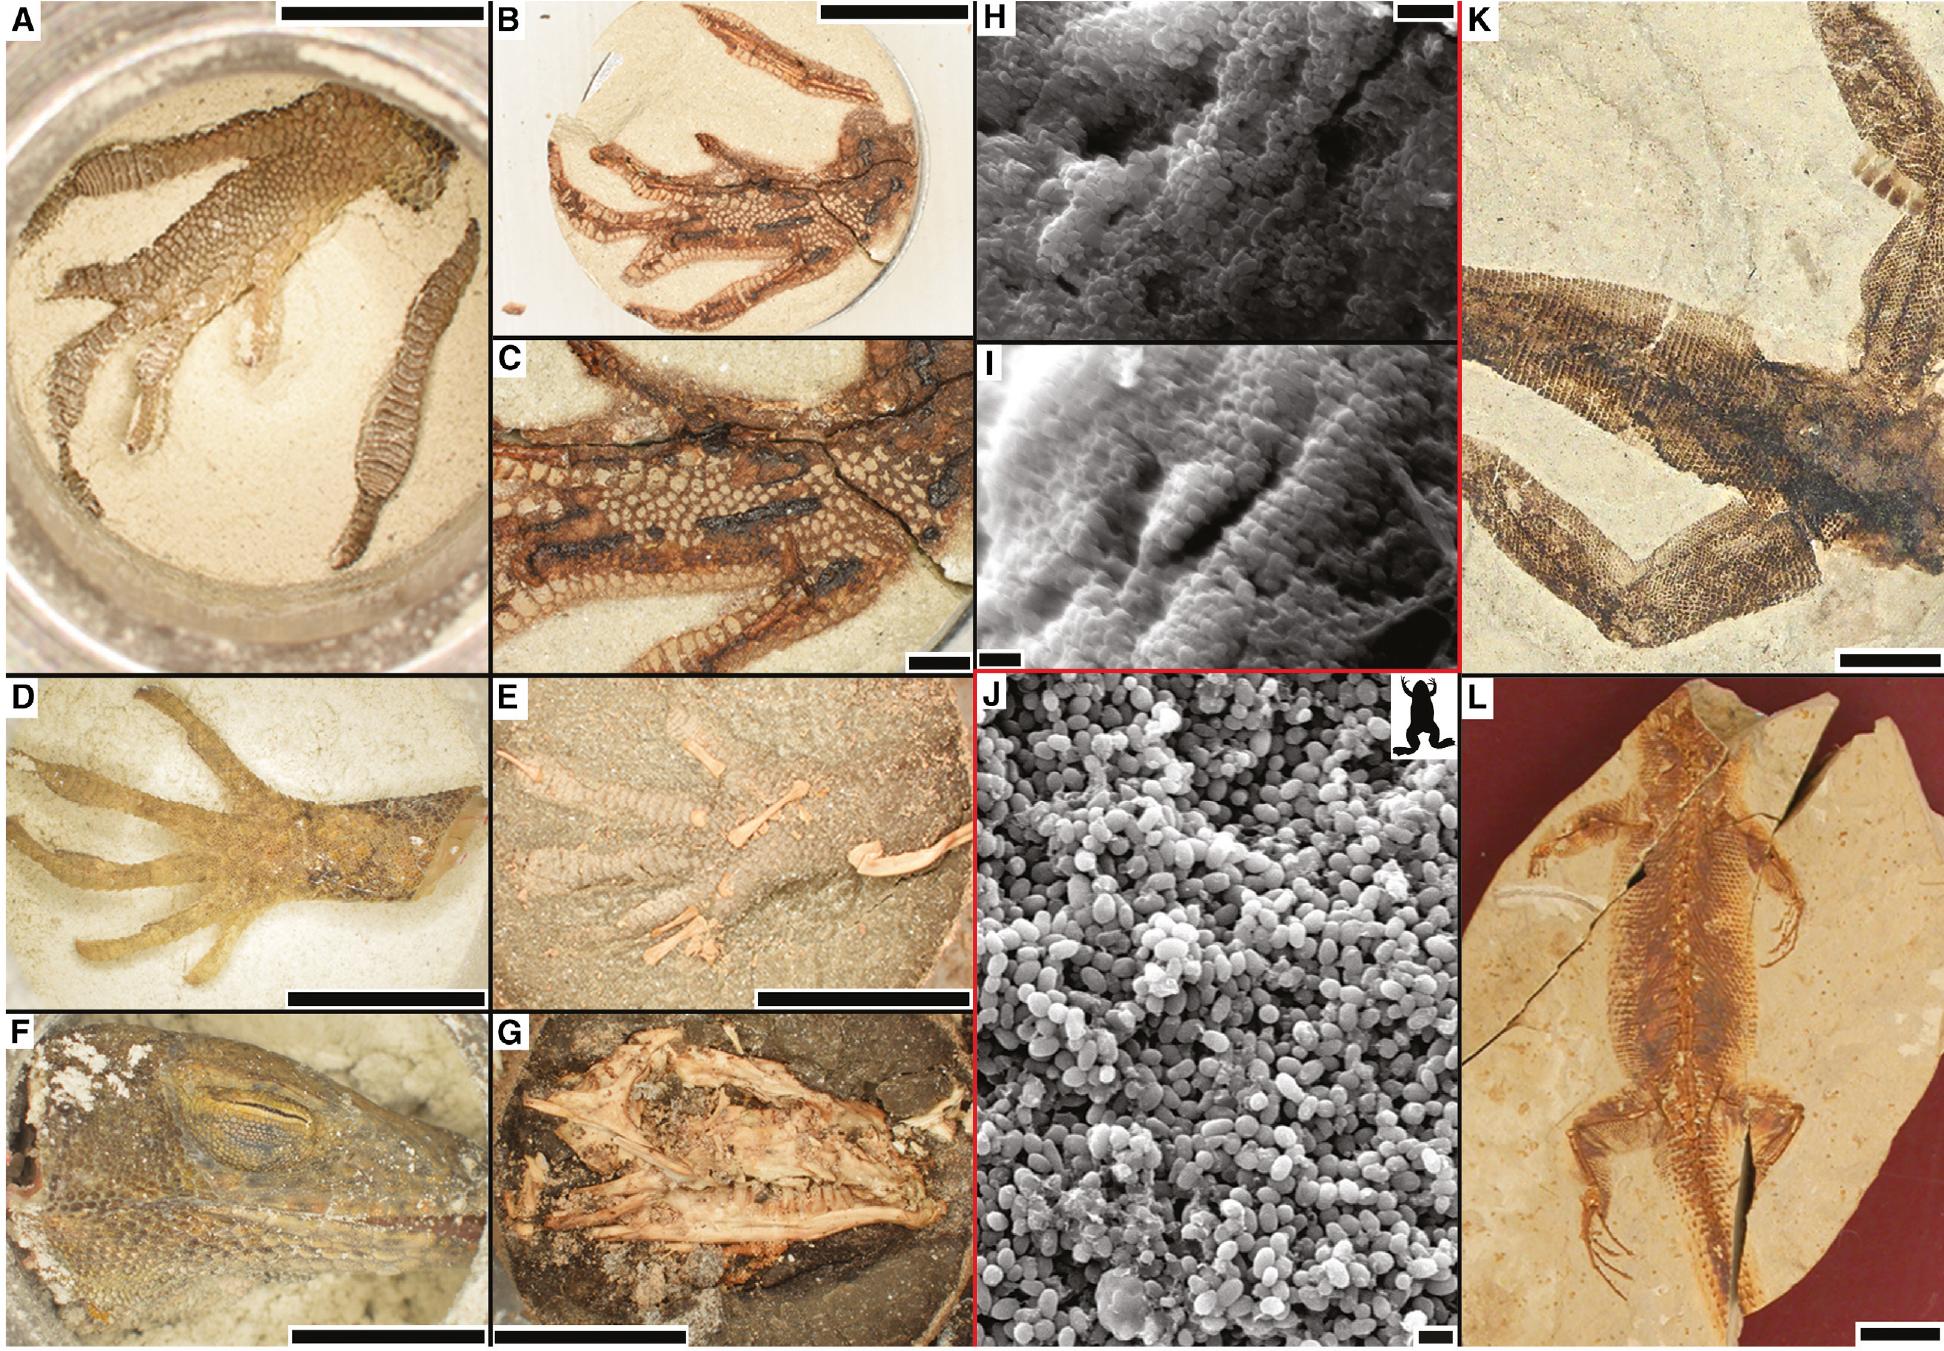 13482-lizard-before-burial